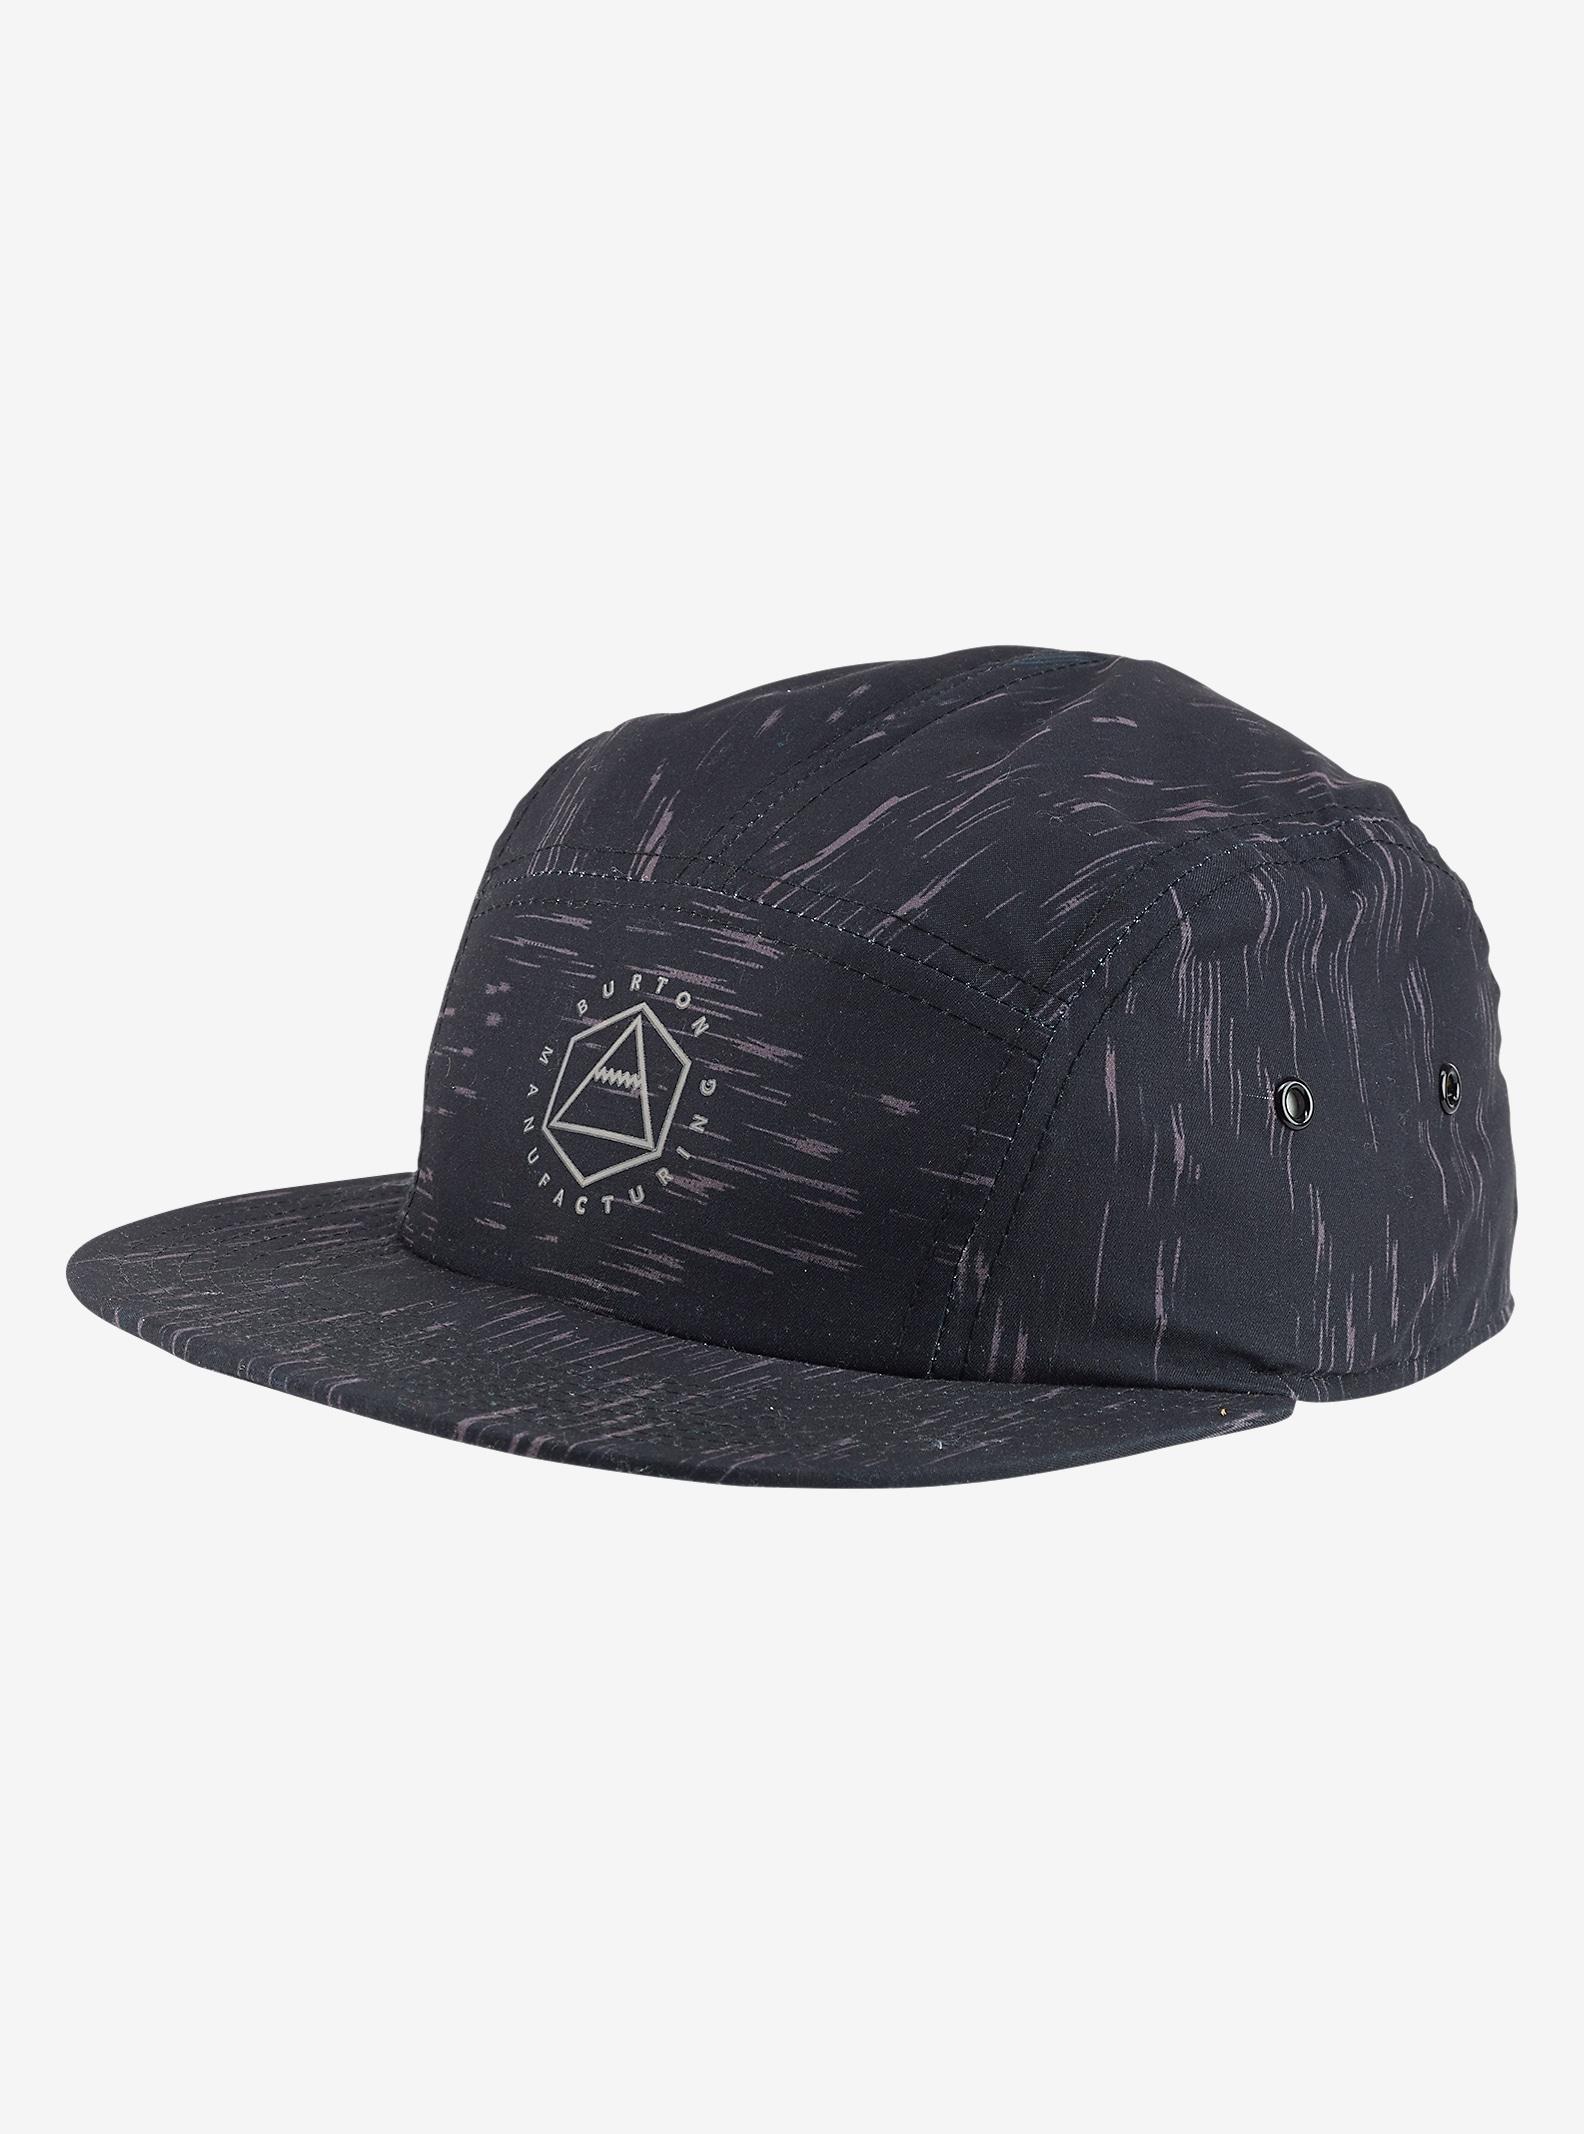 Burton Rainfly Hat shown in True Black Rain